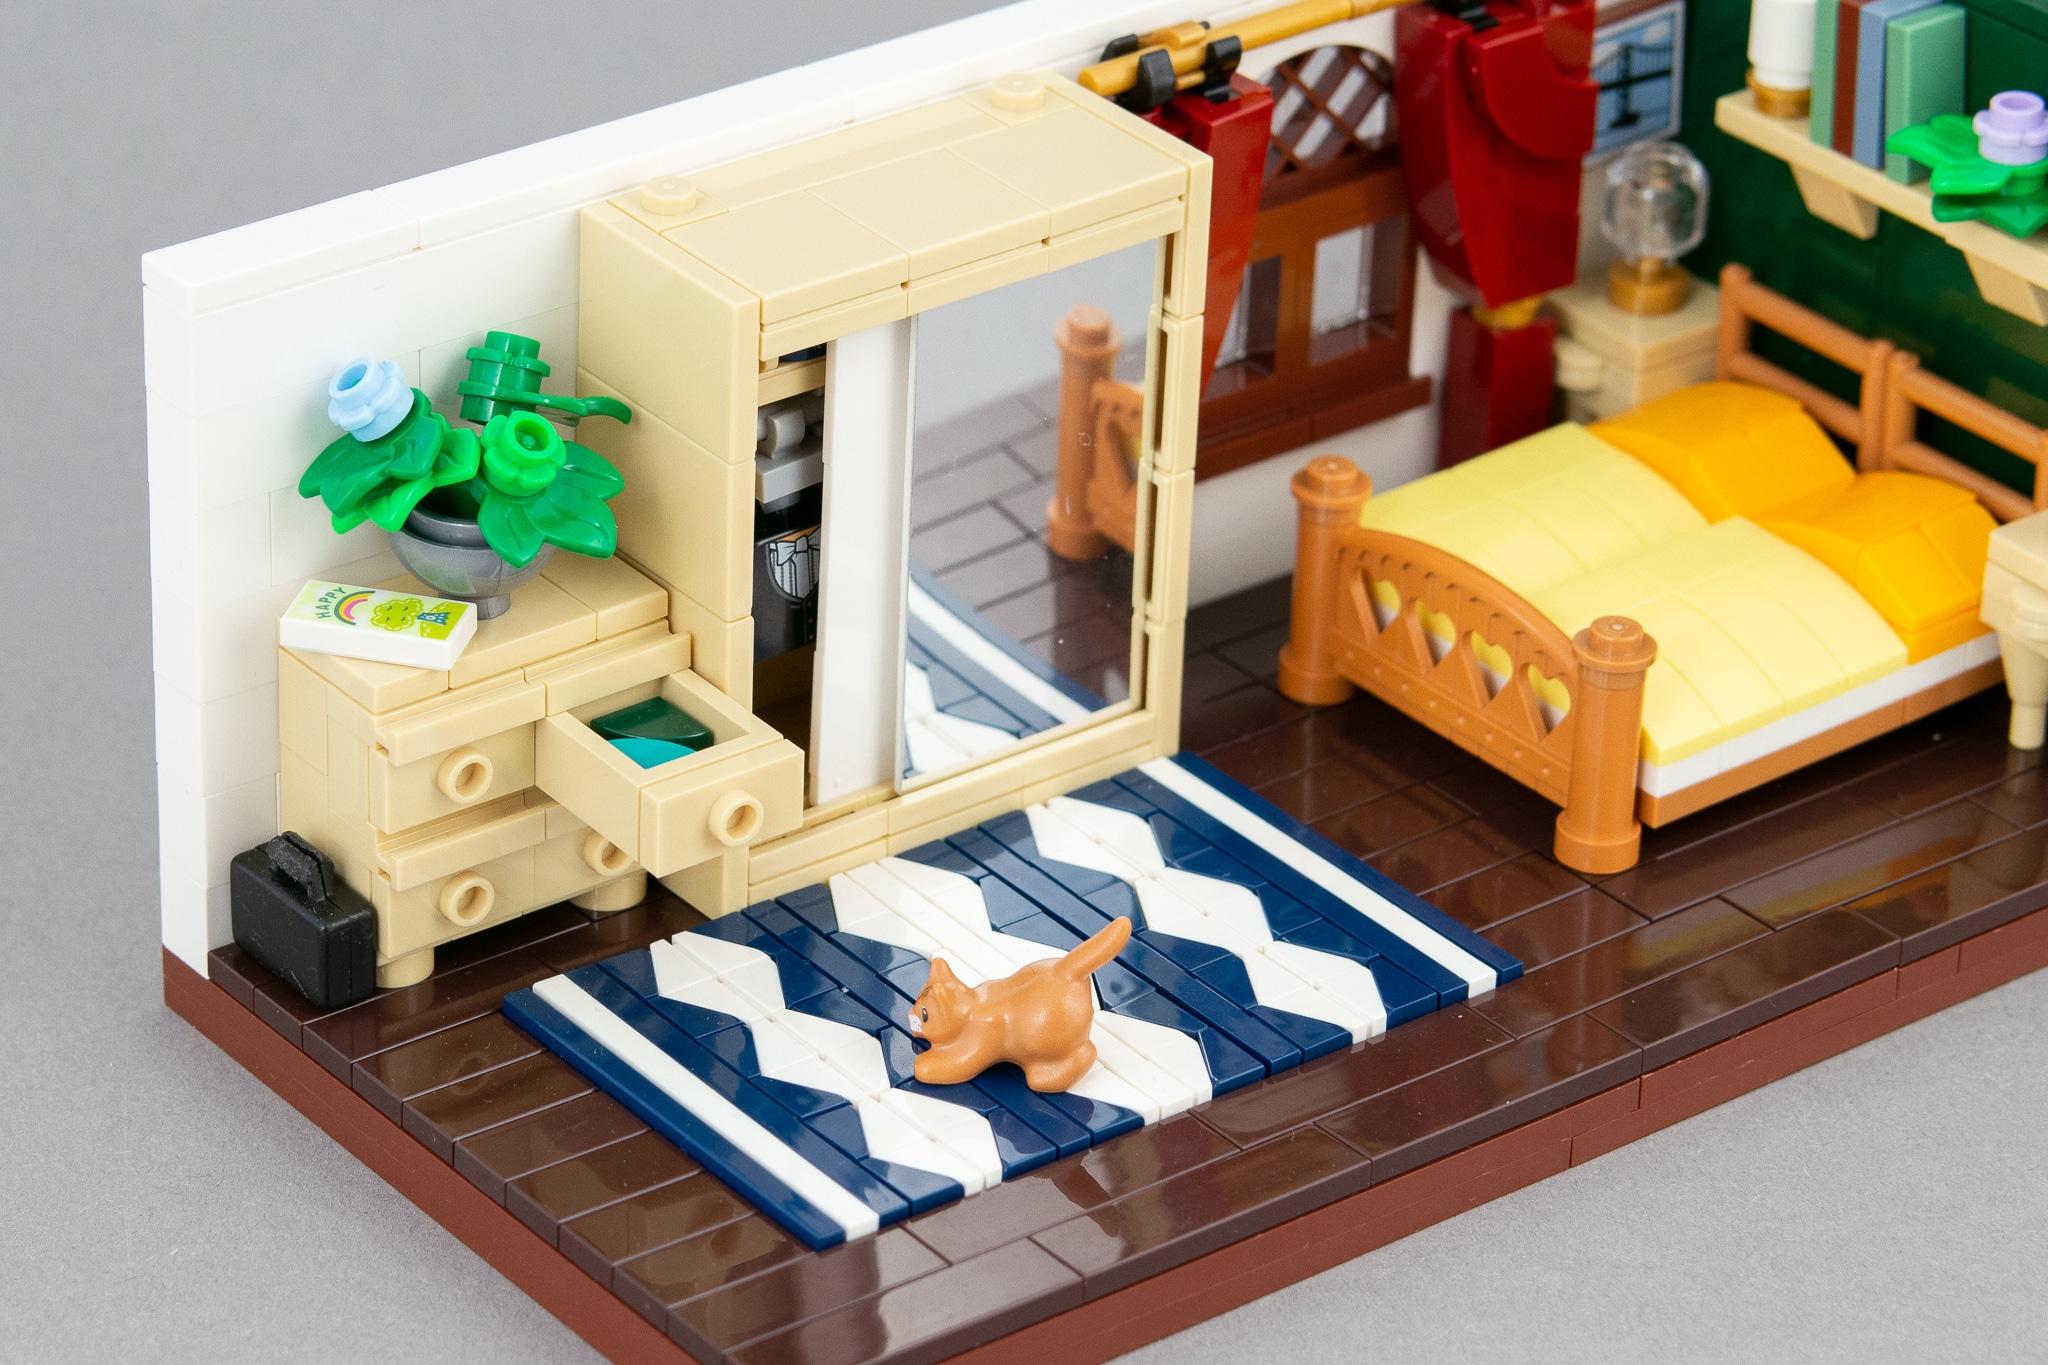 LEGO Schlafzimmer Moc (6)